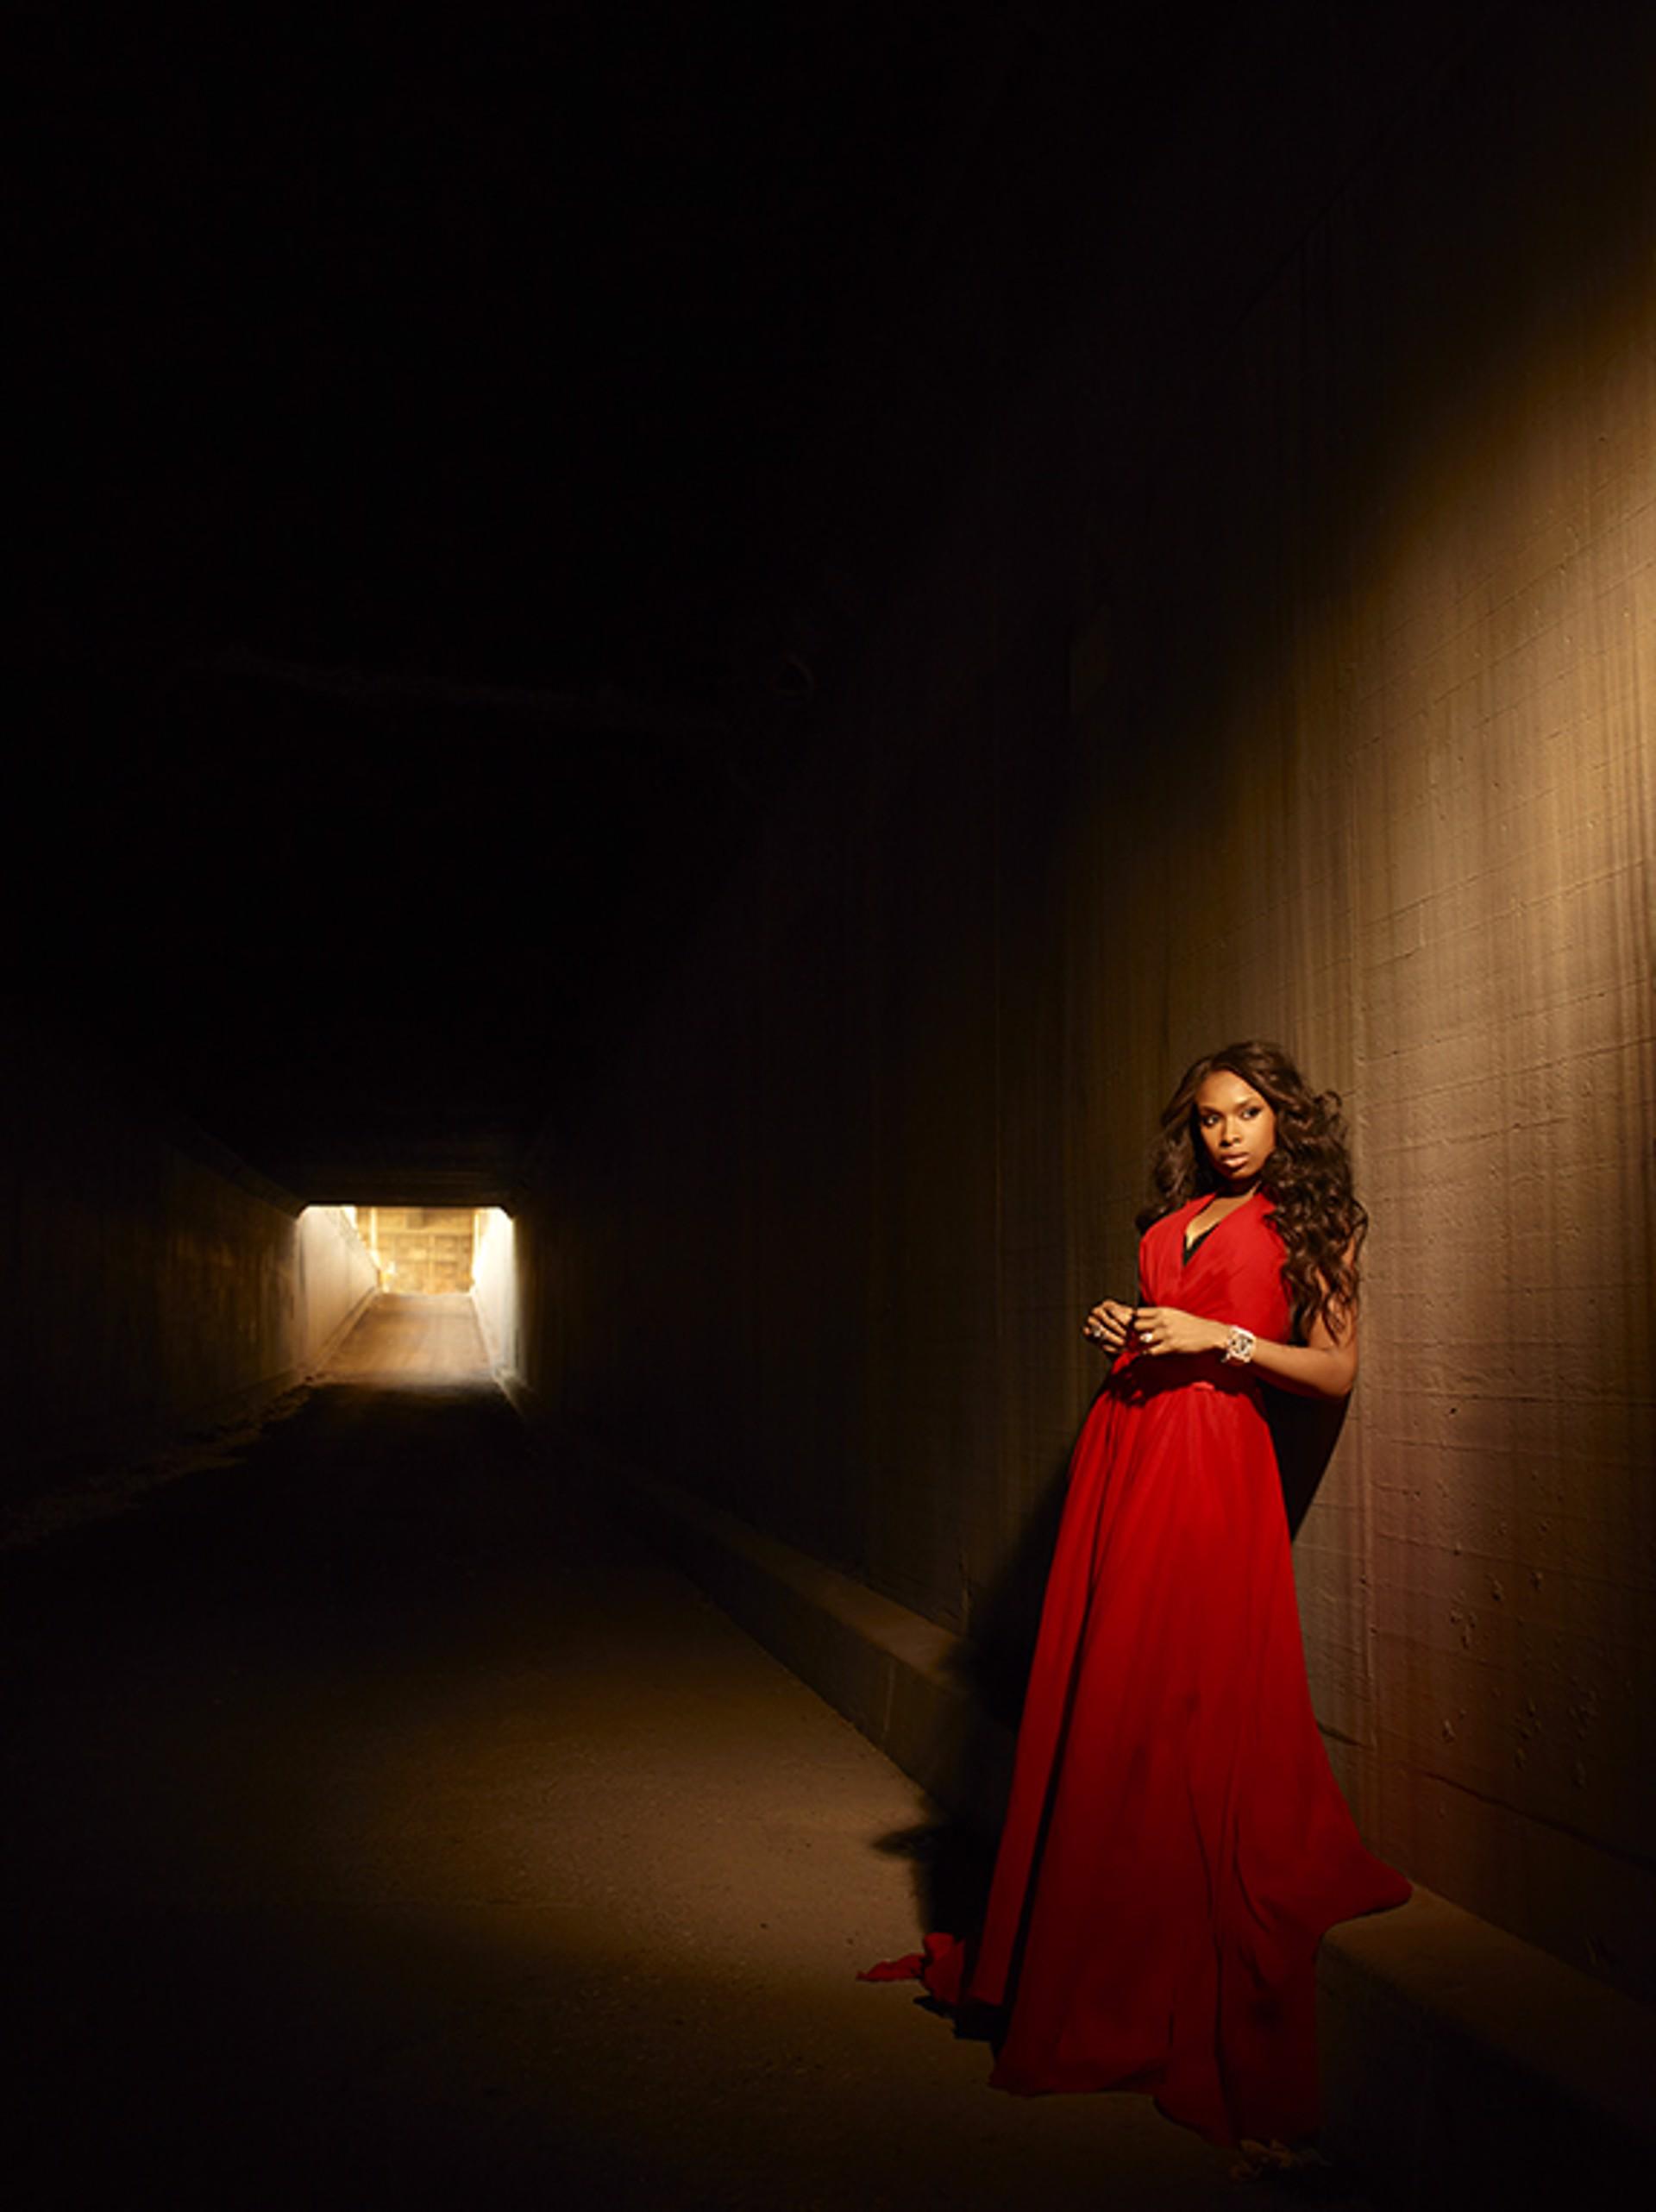 11031 Jennifer Hudson Red Dress Color by Timothy White